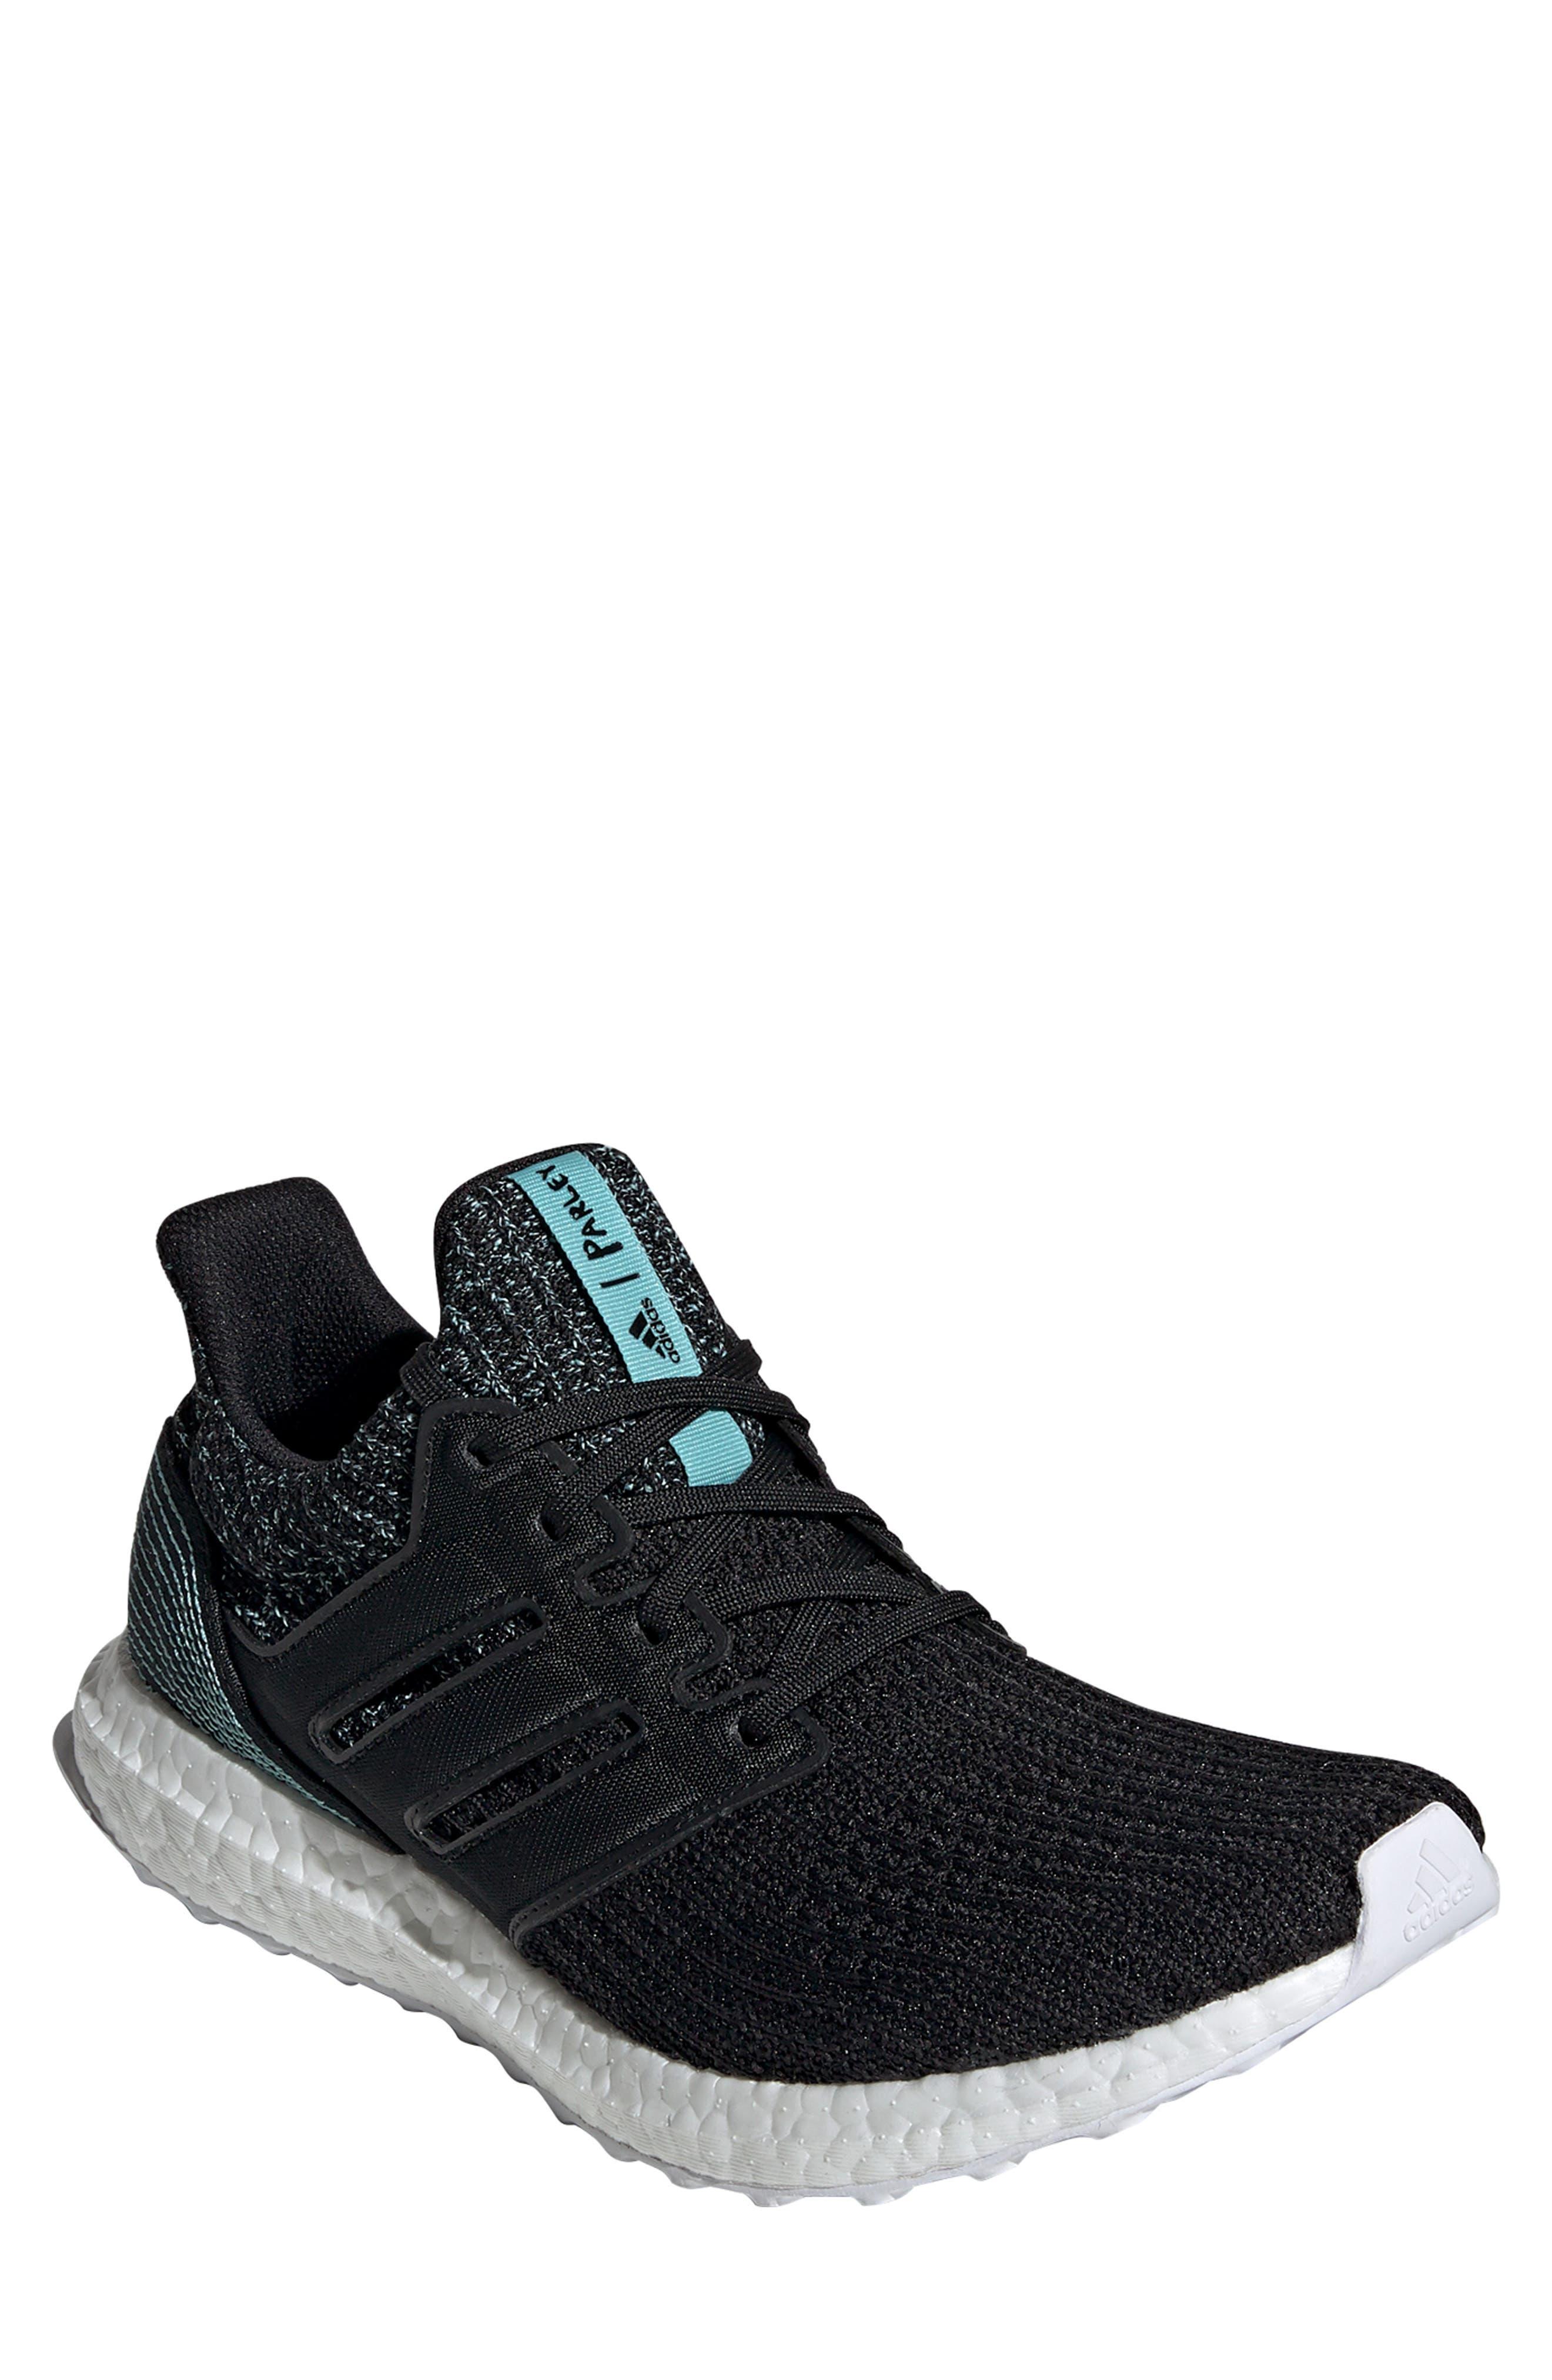 Parley UltraBoost Sneaker,                             Main thumbnail 1, color,                             001